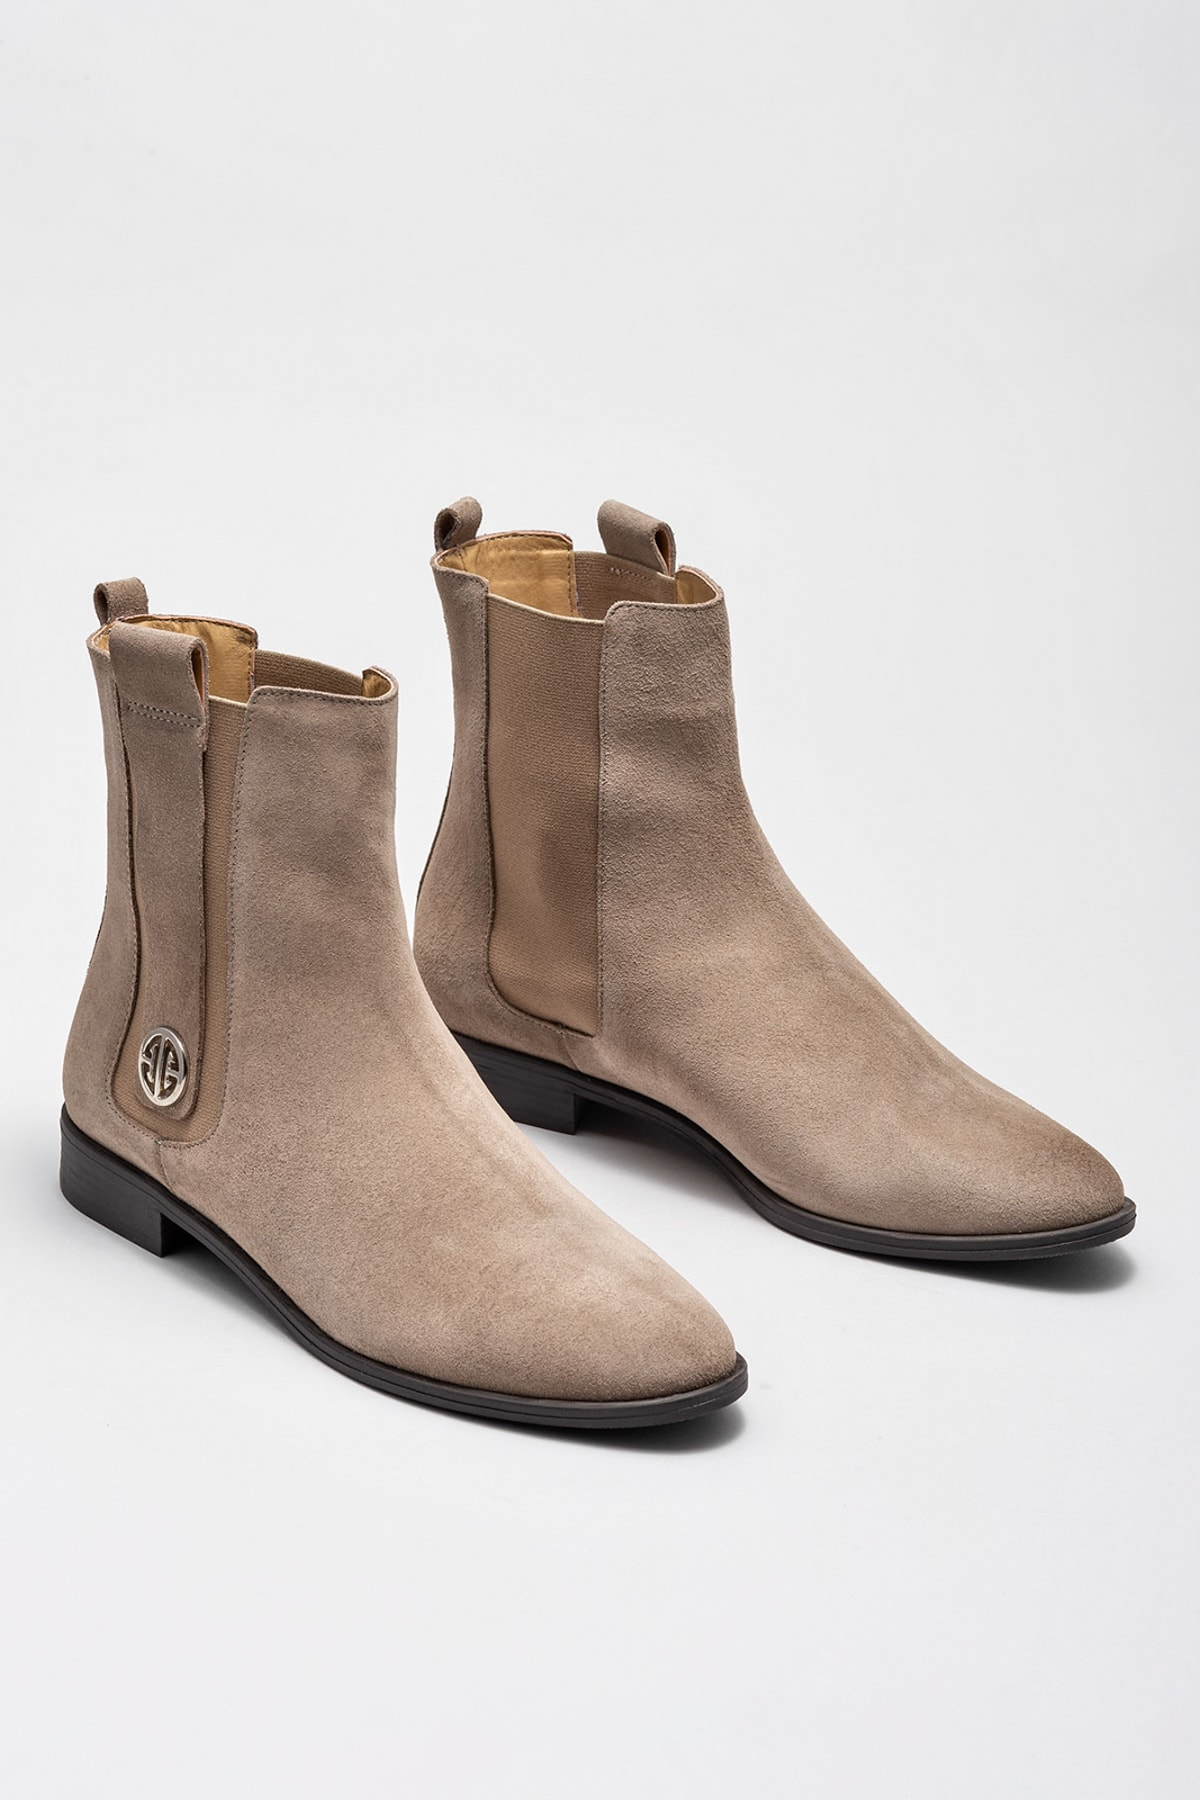 Elle Shoes Kadın Koloma Vızon Bot & Bootie 20KZA02161-88 2